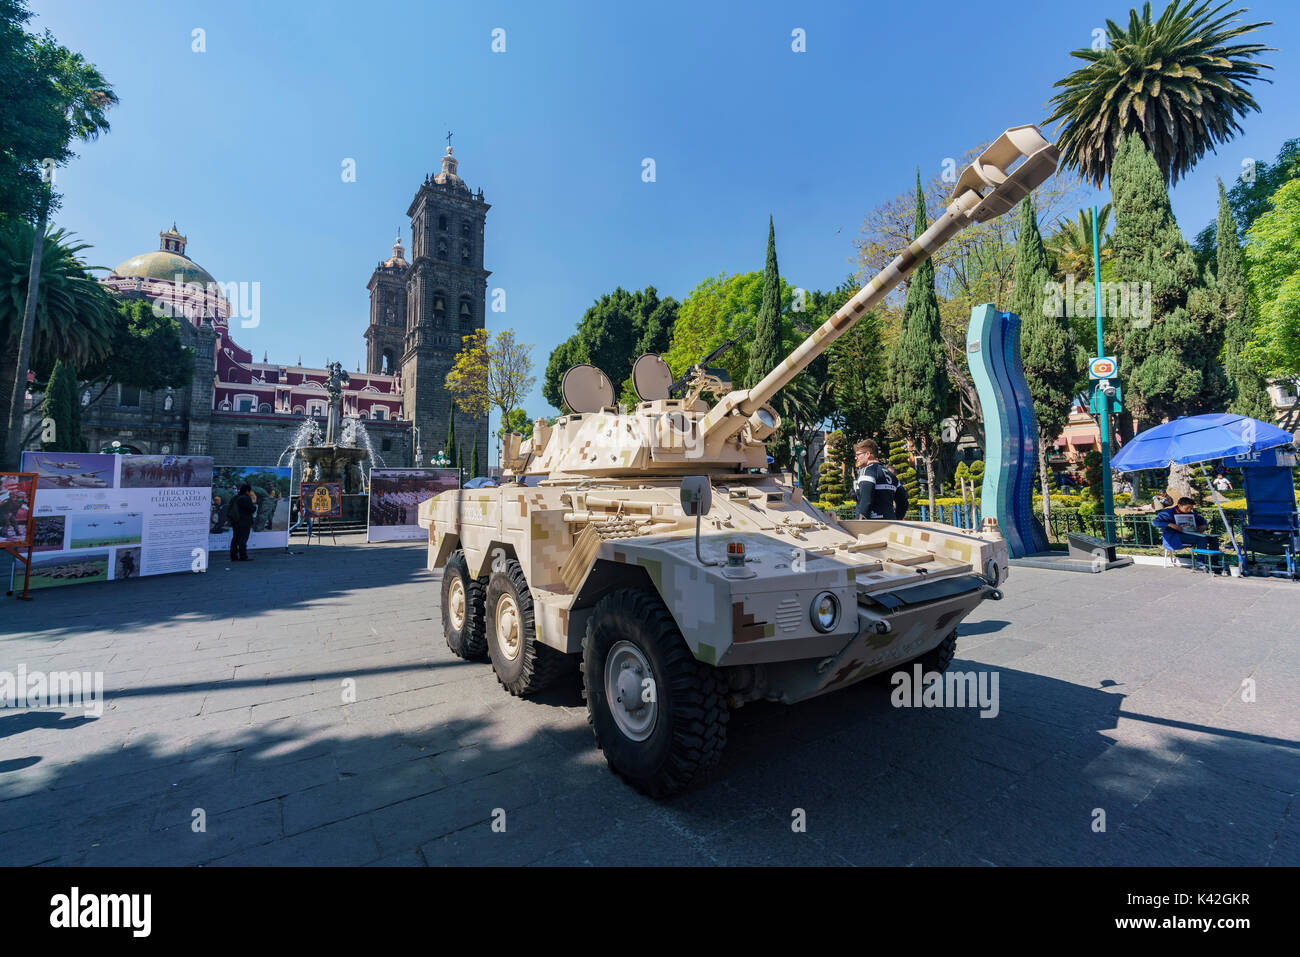 Puebla, FEB 18: Military show on FEB 18, 2017 at Zocalo, Puebla, Mexico Stock Photo